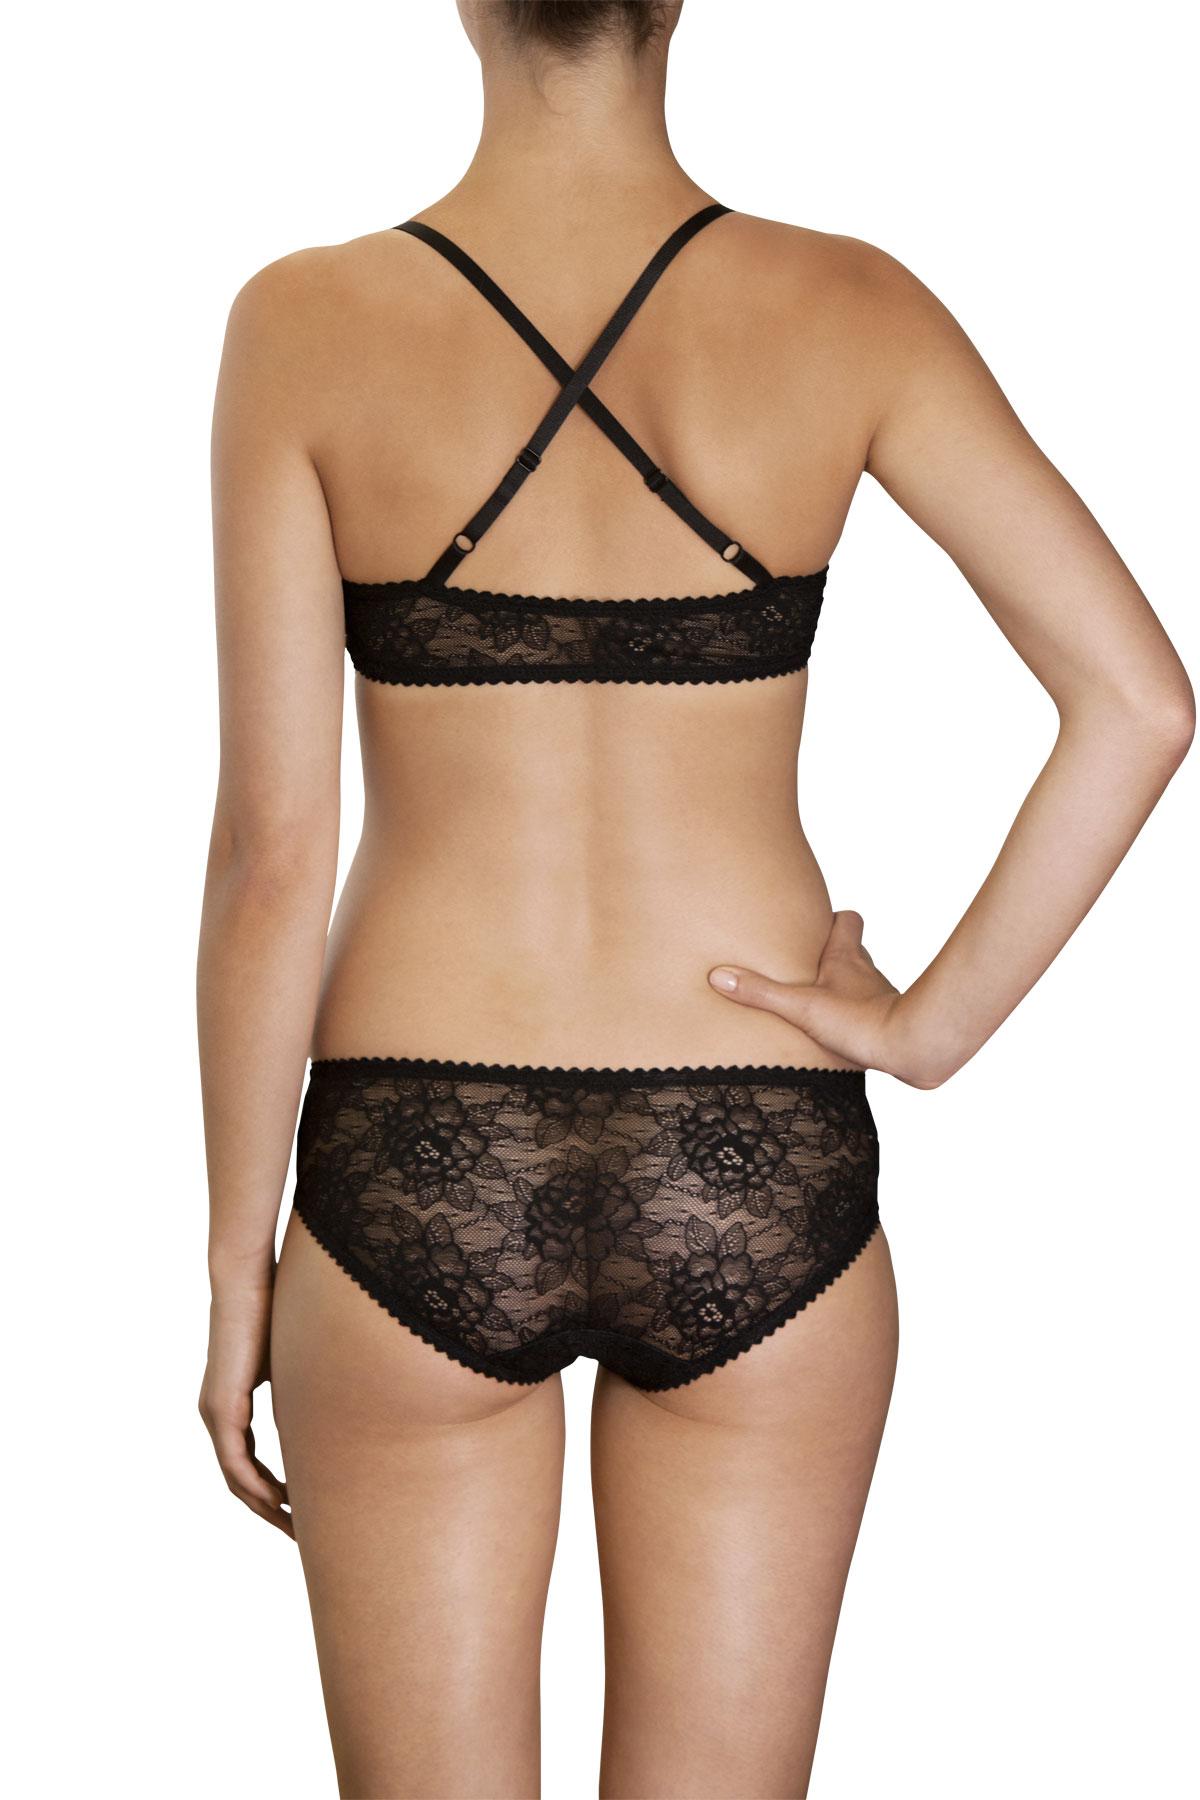 Black Lace Panties 82